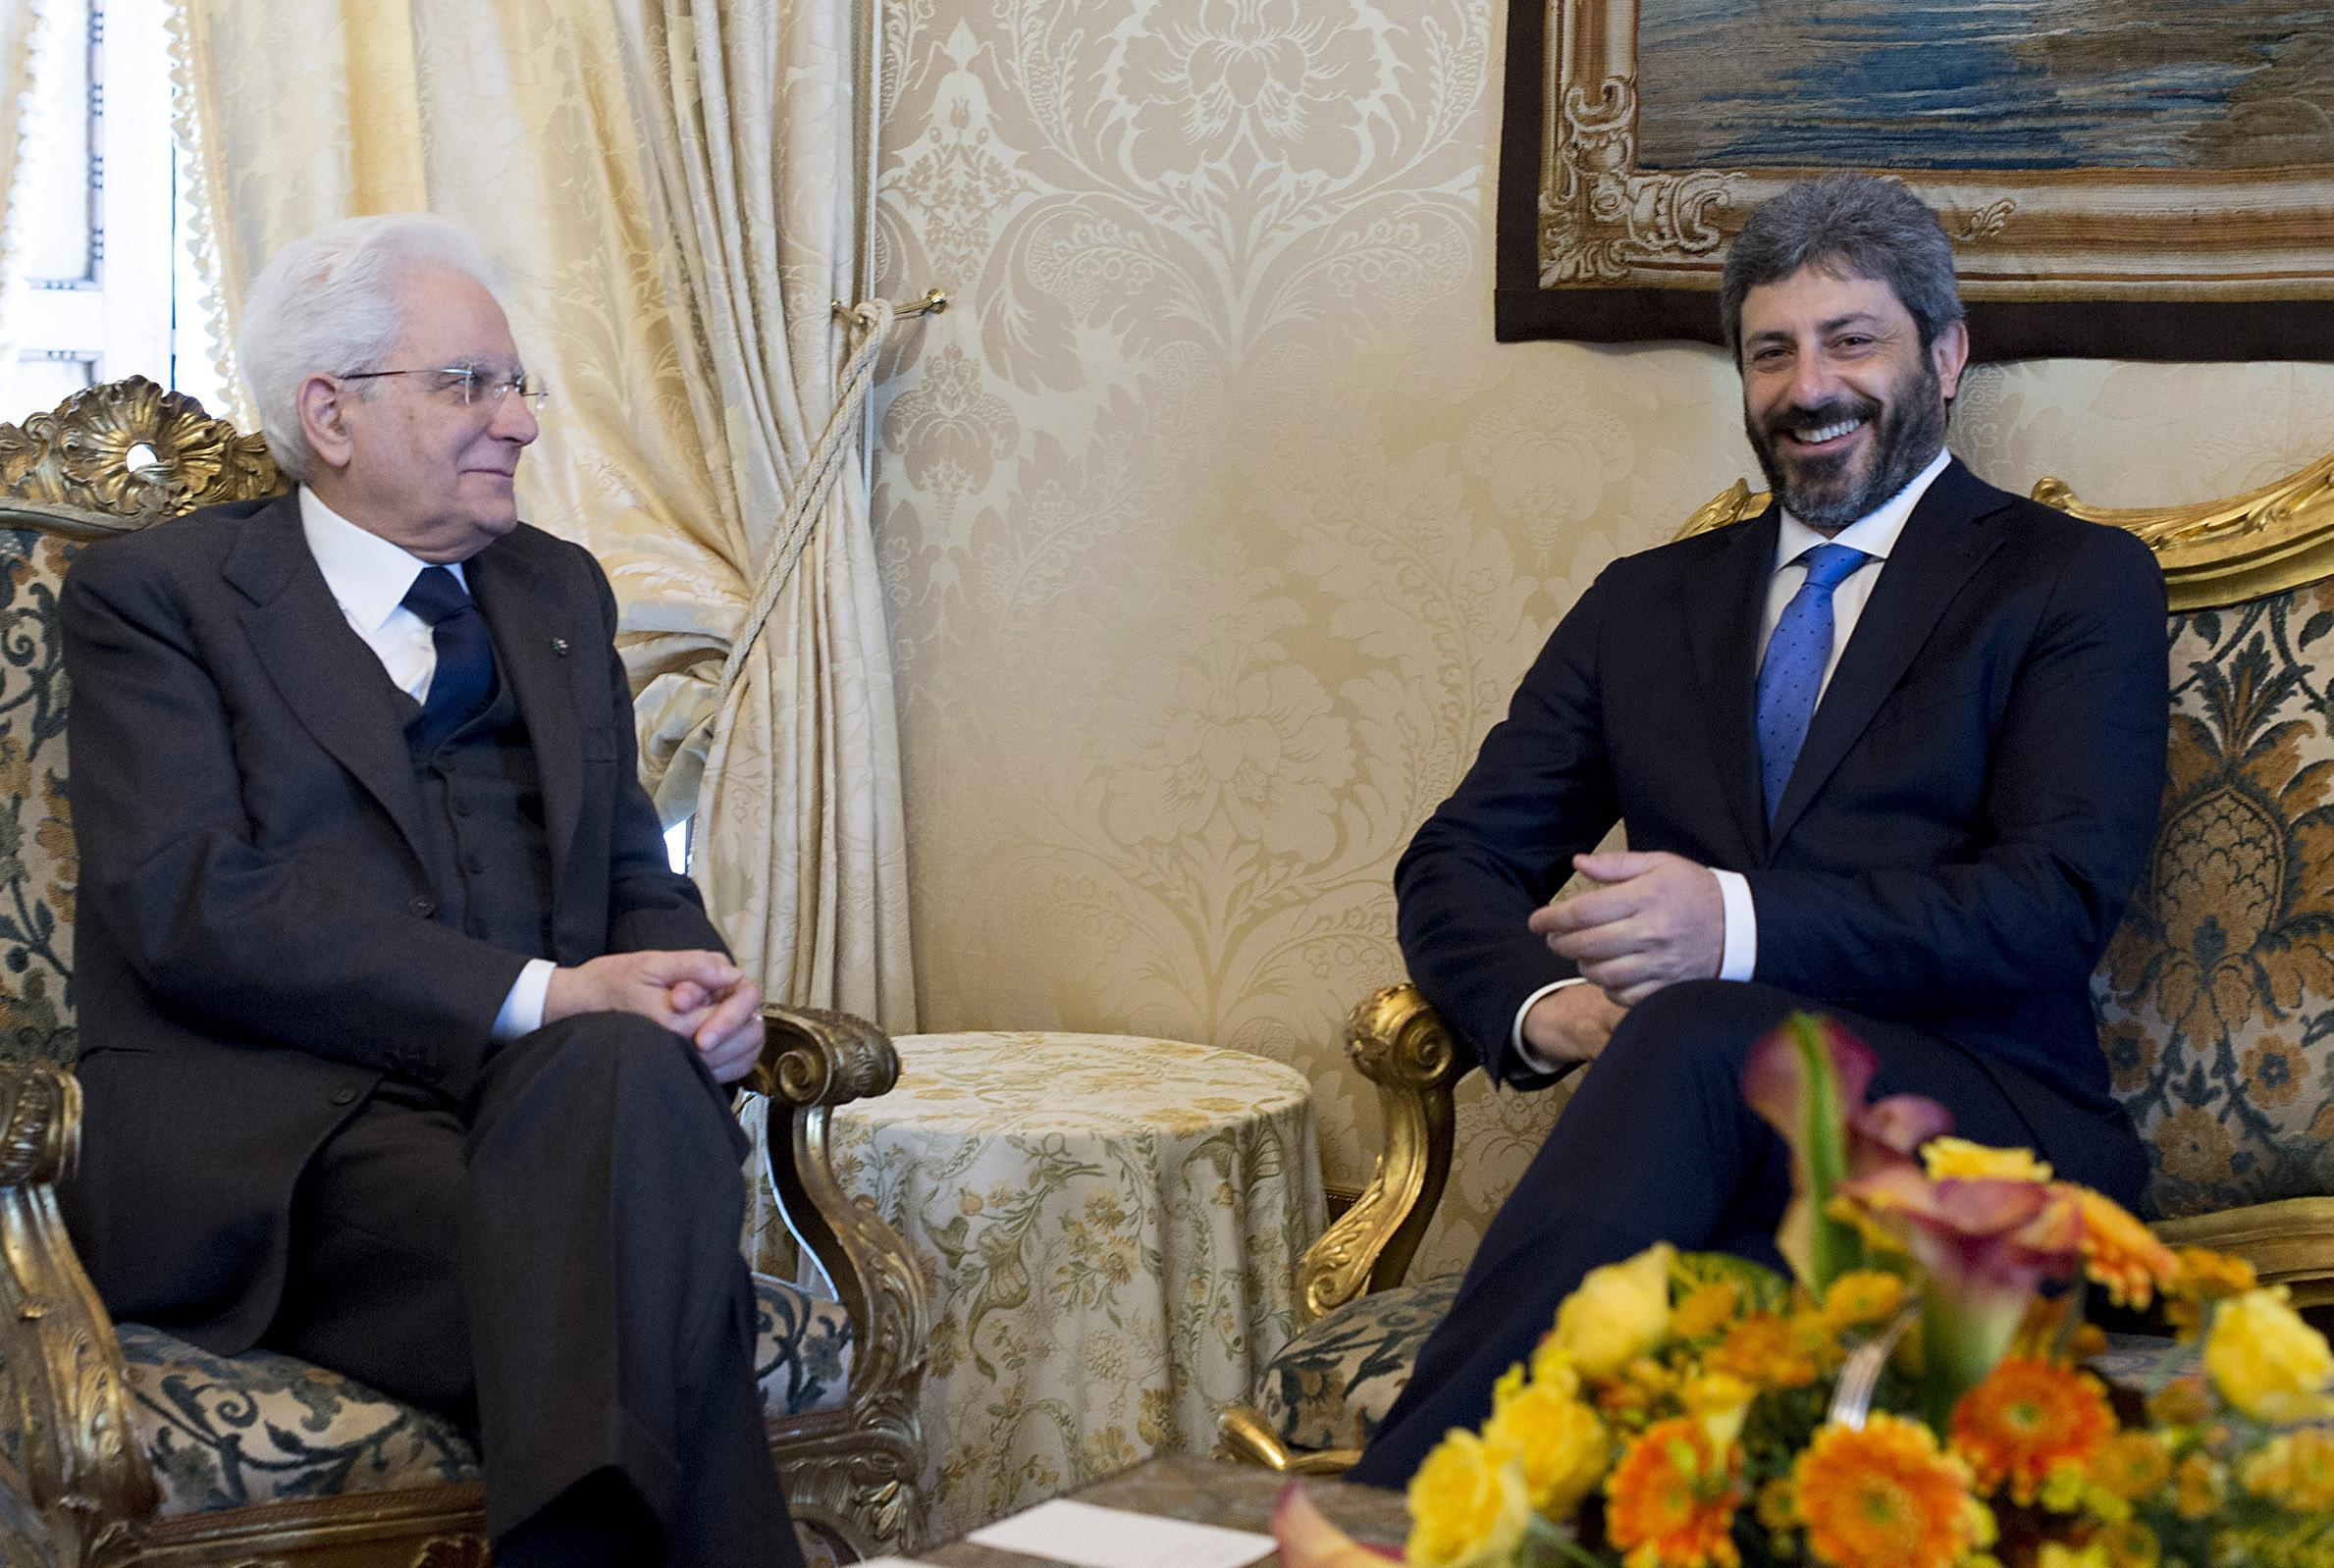 Governo, Salvini: 'Centrodestra e M5s governino'. Verso mandato esplorativo a Fico